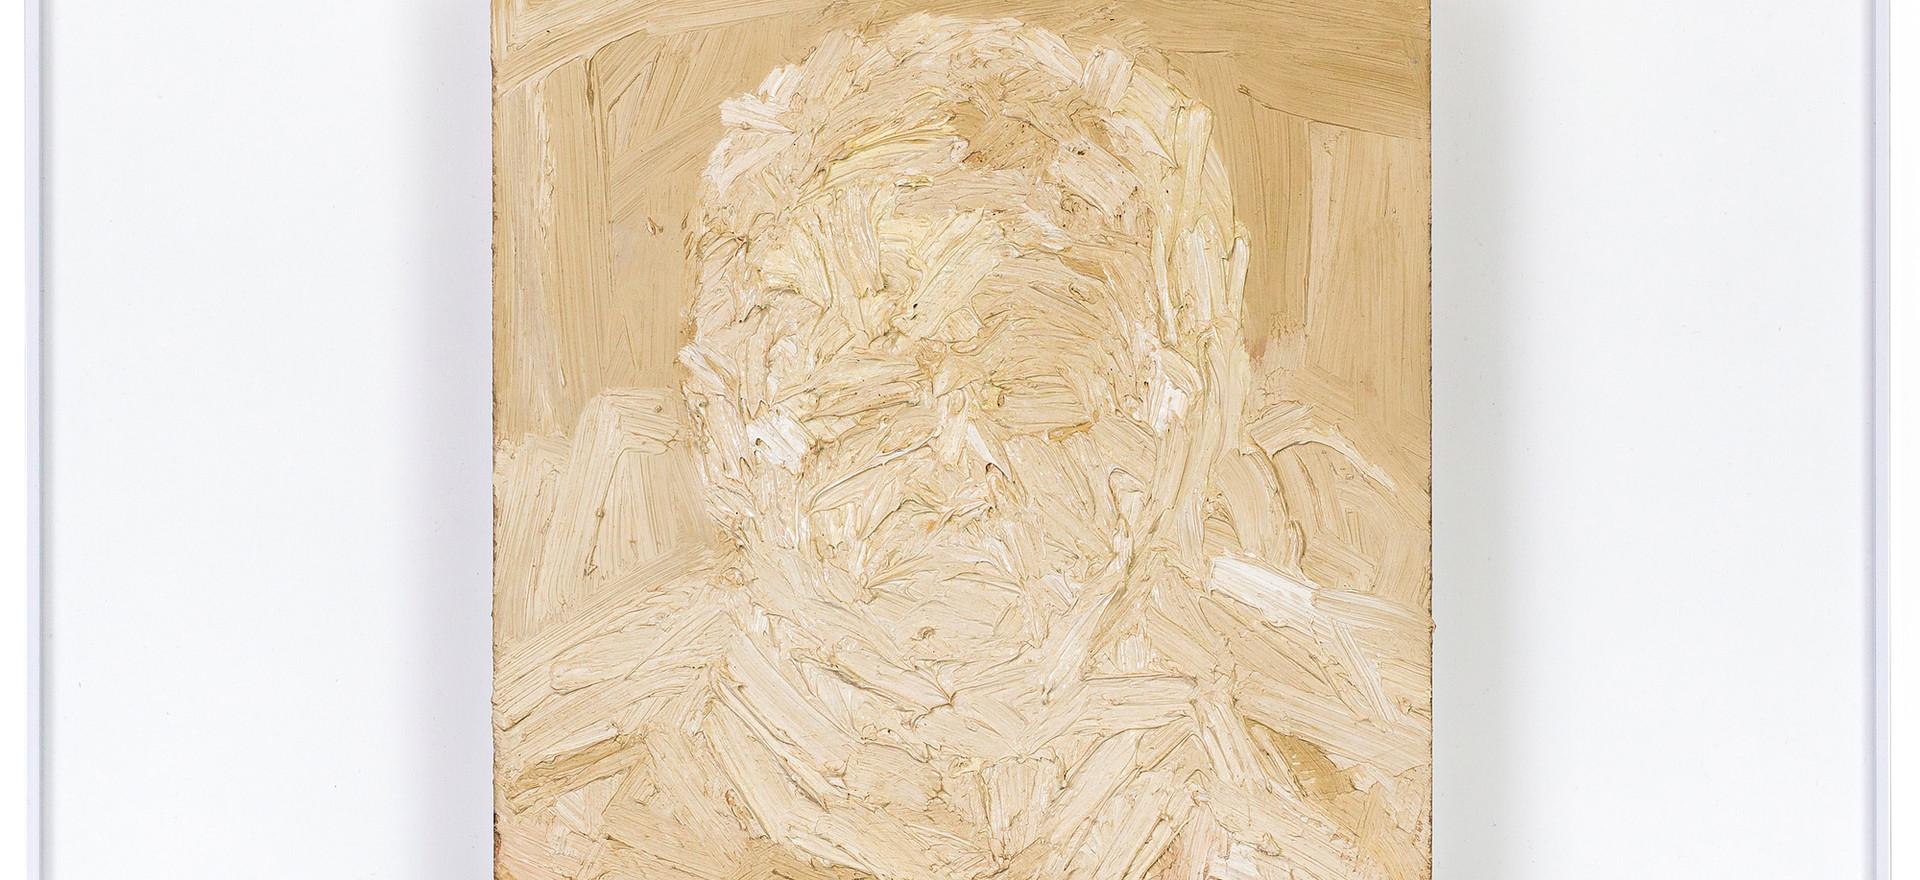 'With Alberto in mind', 2012, oil on sandstone, 61 x 61 cm | framed